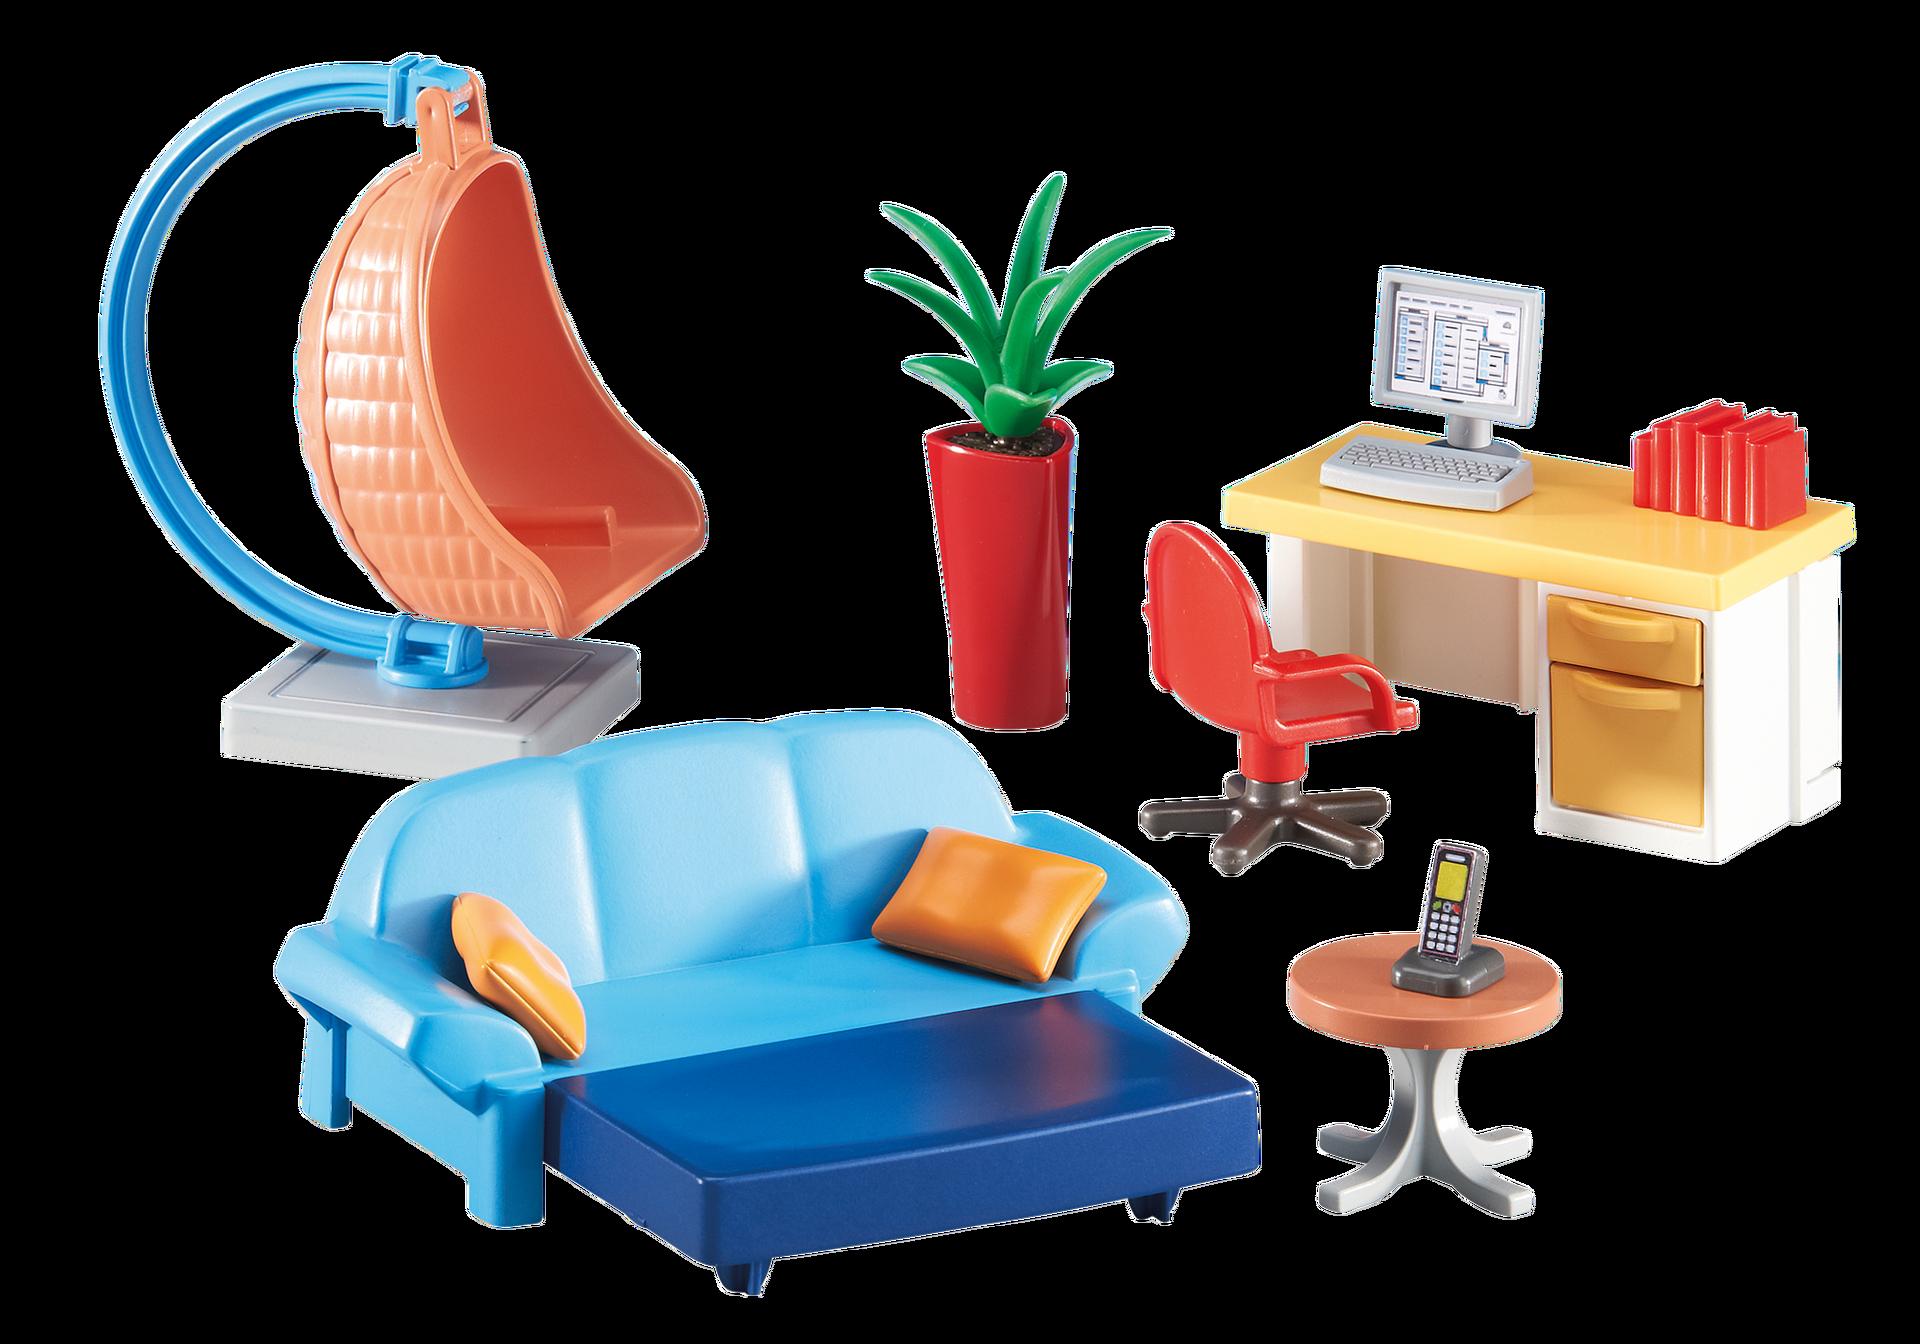 playmobil allemagne produit n°6457 gamme : city life produit, Wohnzimmer dekoo